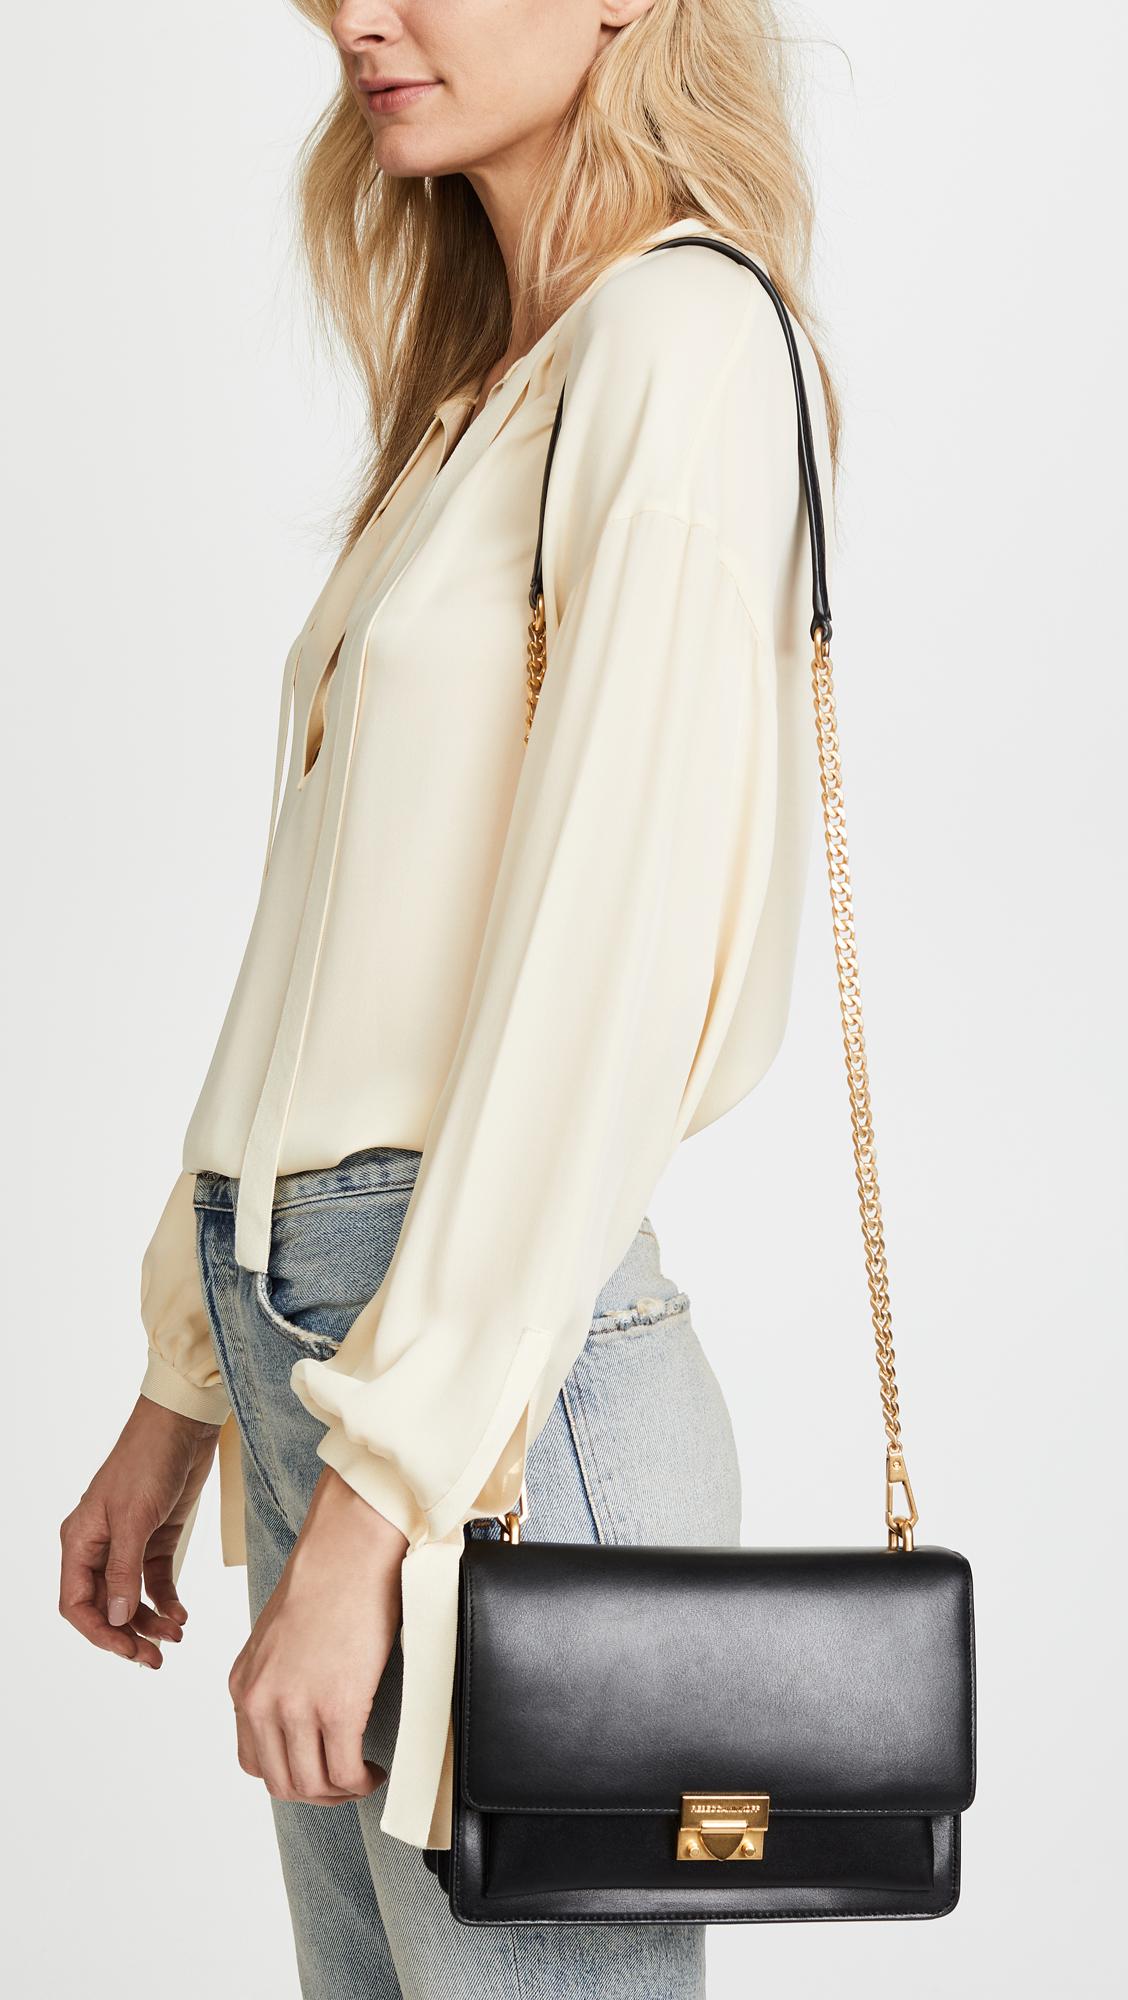 039380deb0ac Rebecca Minkoff Christy Medium Shoulder Bag